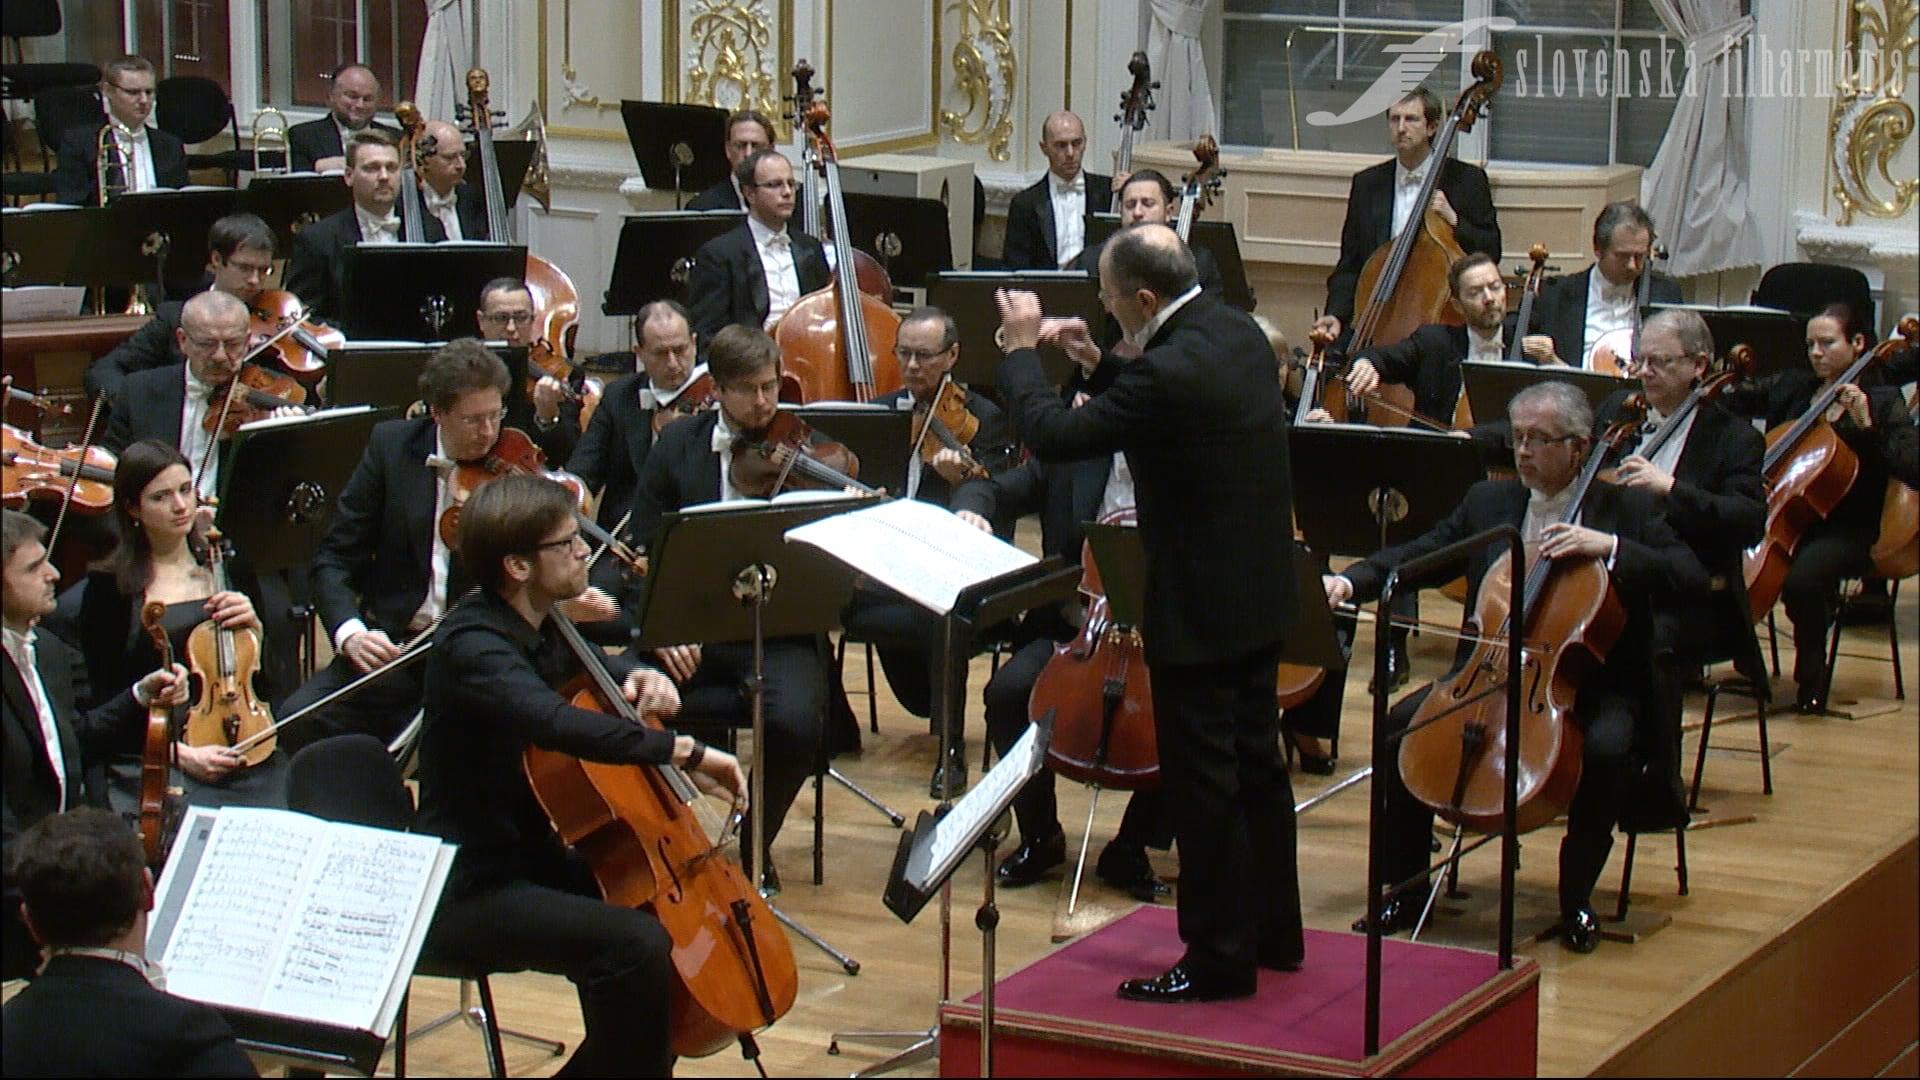 Dutilleux, Debussy, Szymanowski